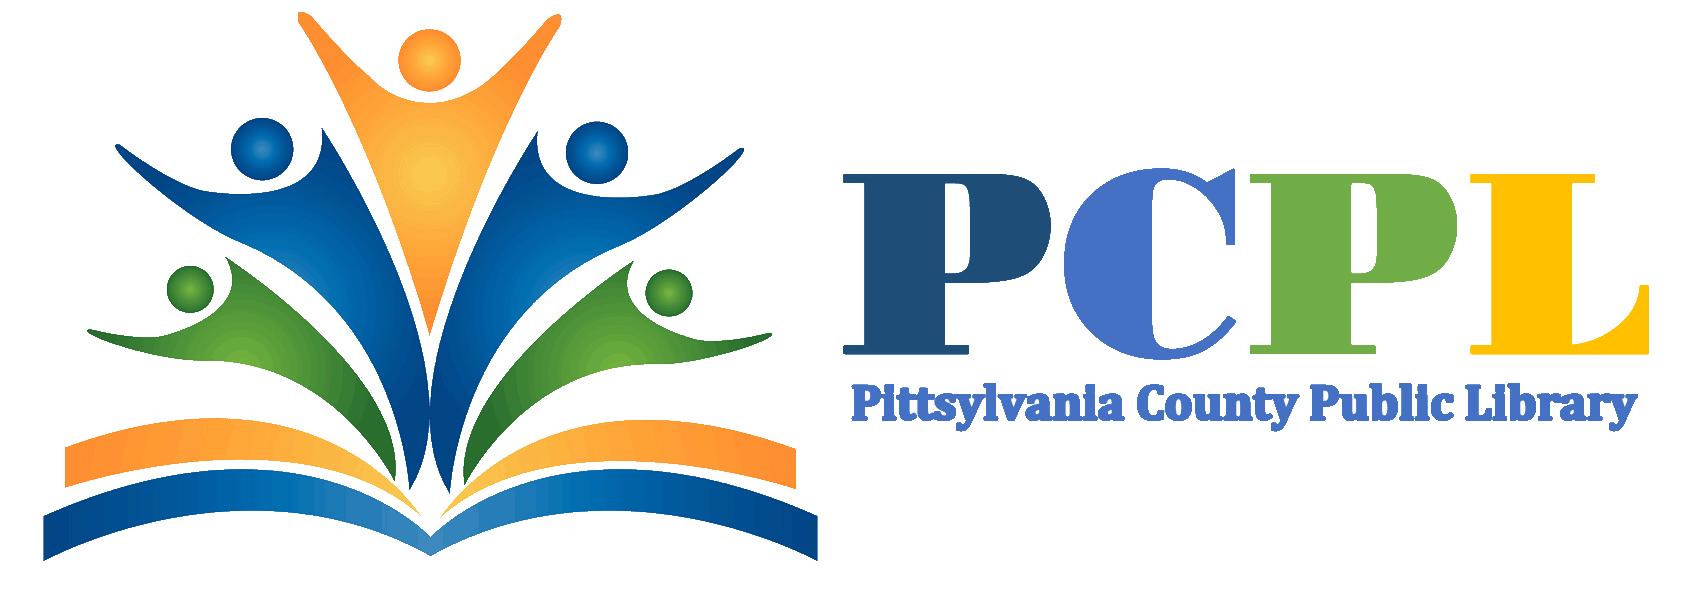 Pit County Pub Library logo